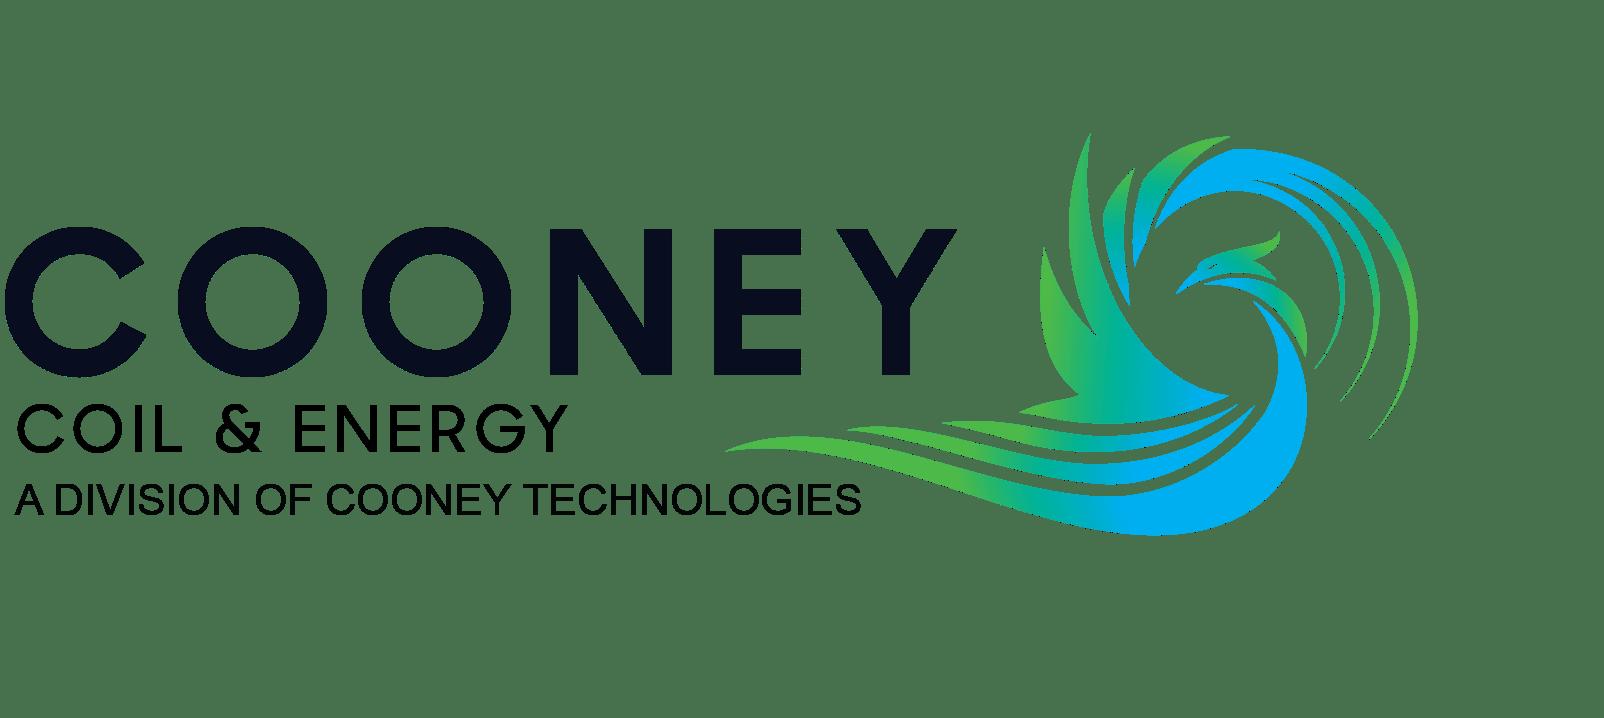 Cooney Coil & Energy Logo